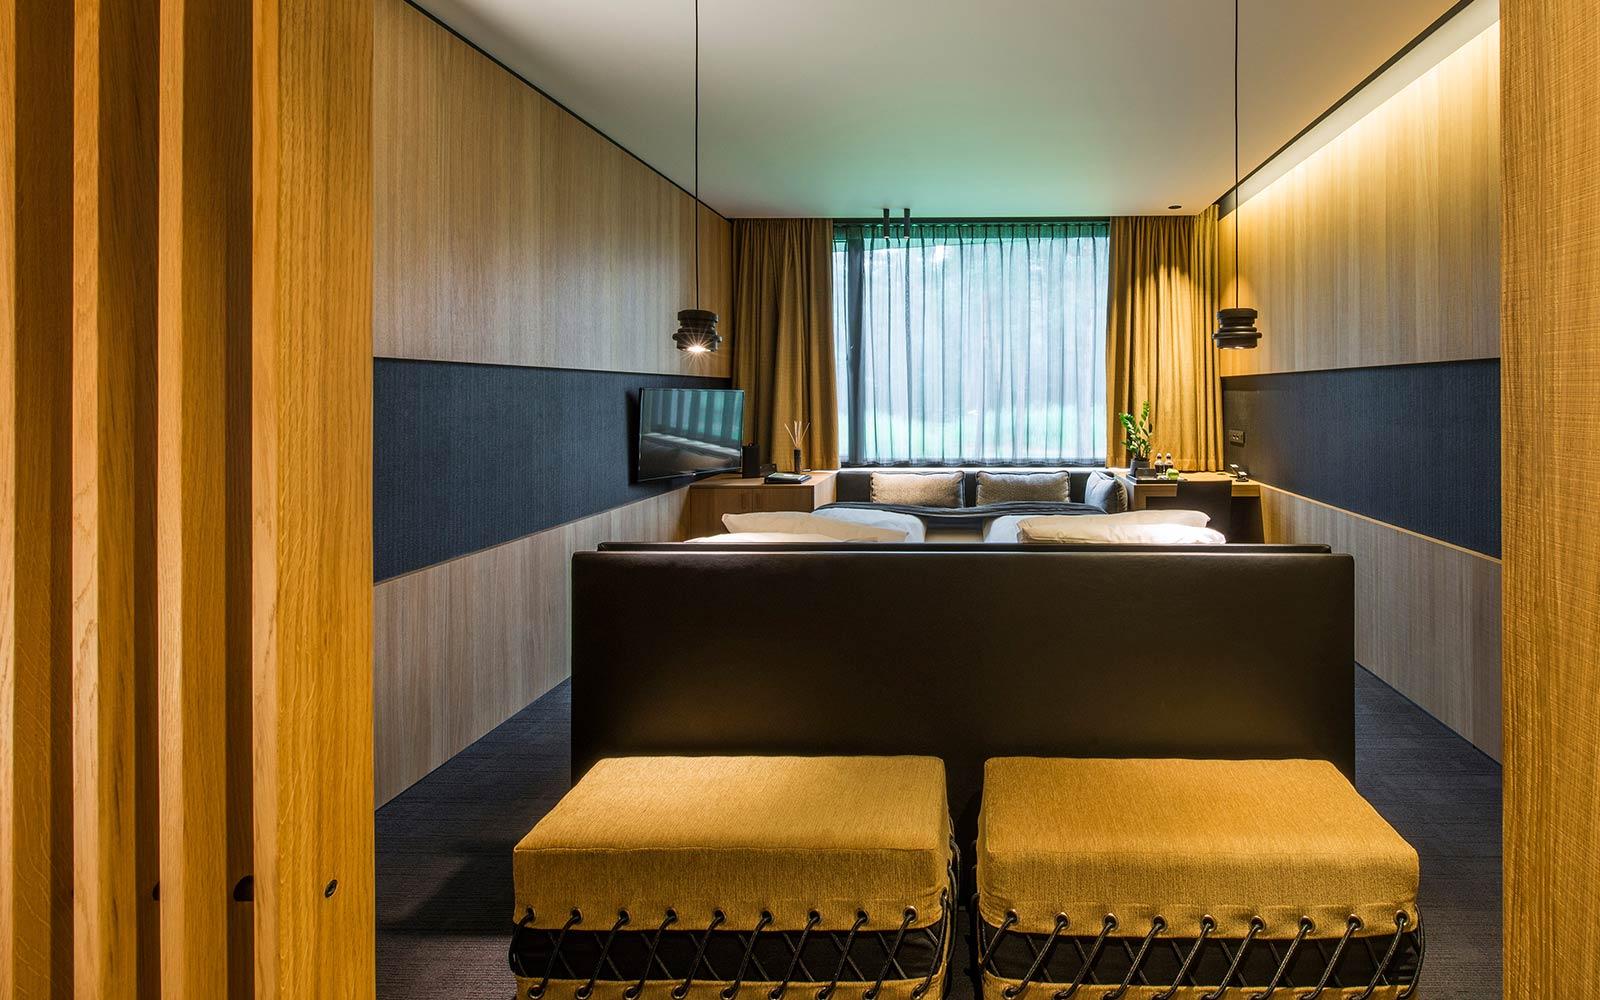 5 star superior Hotel La Butte aux Bois accommodation